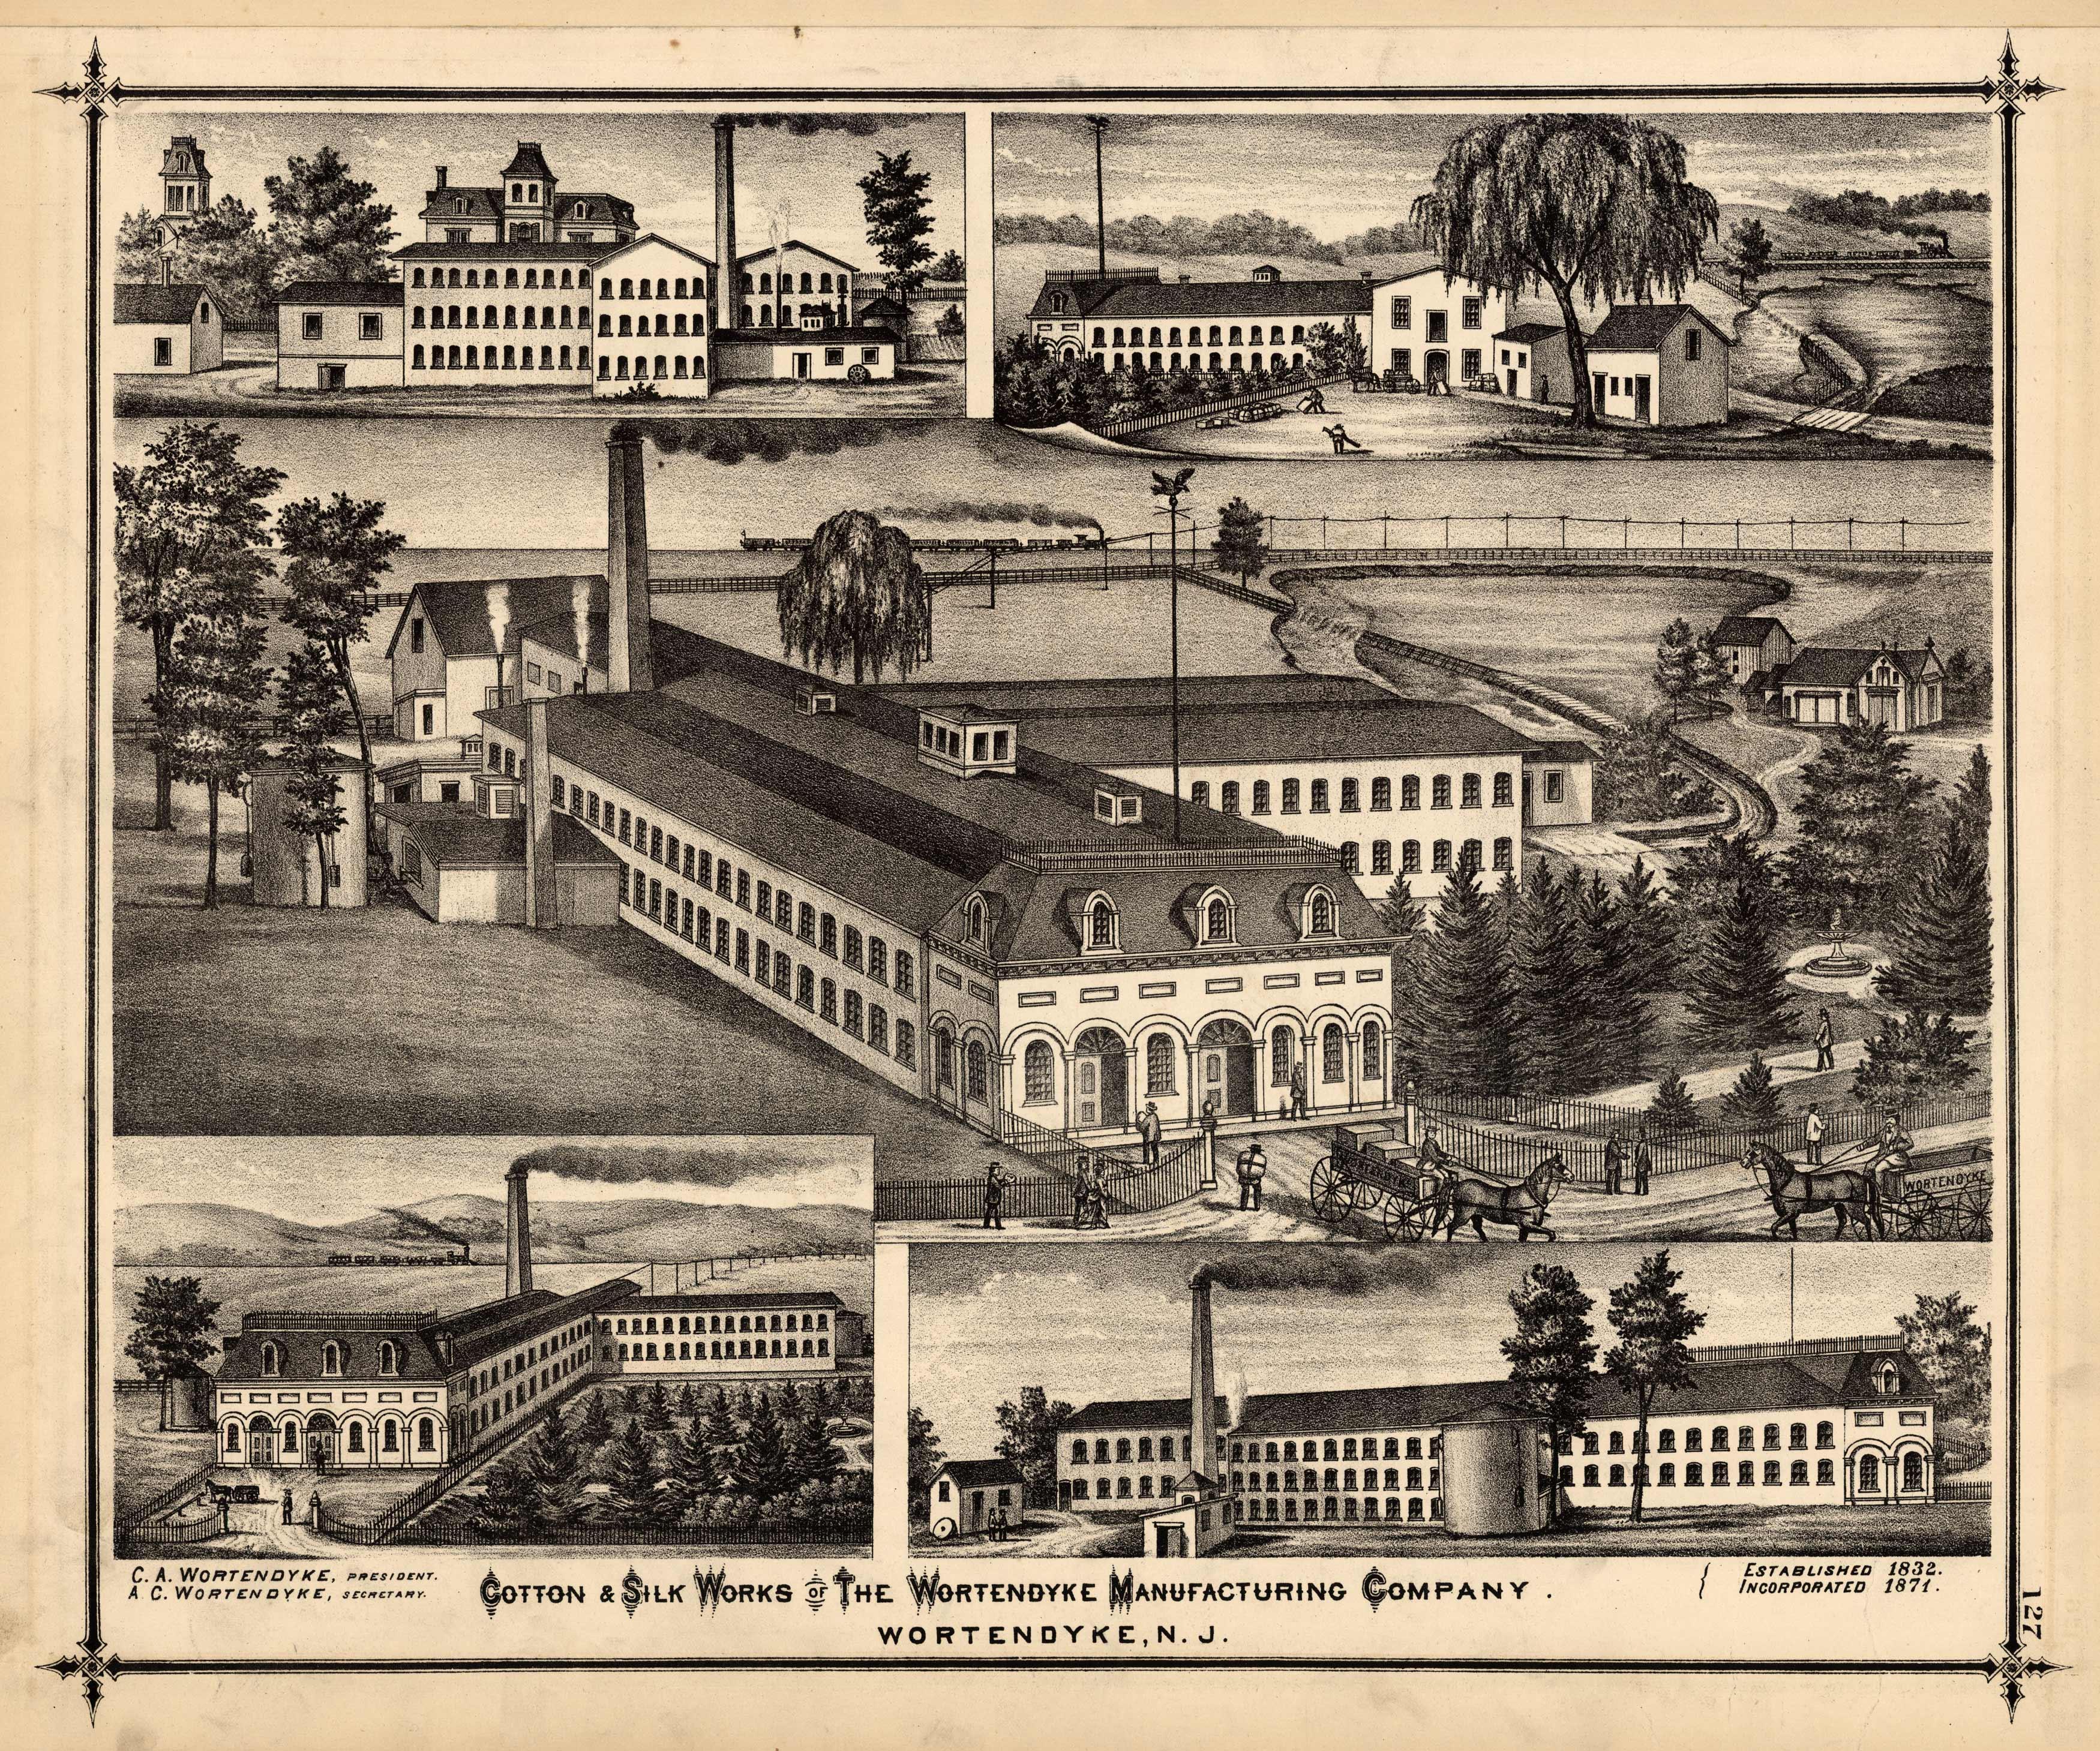 Cotton & Silk Works of The Wortendyke Manufacturing Company. Wortendyke